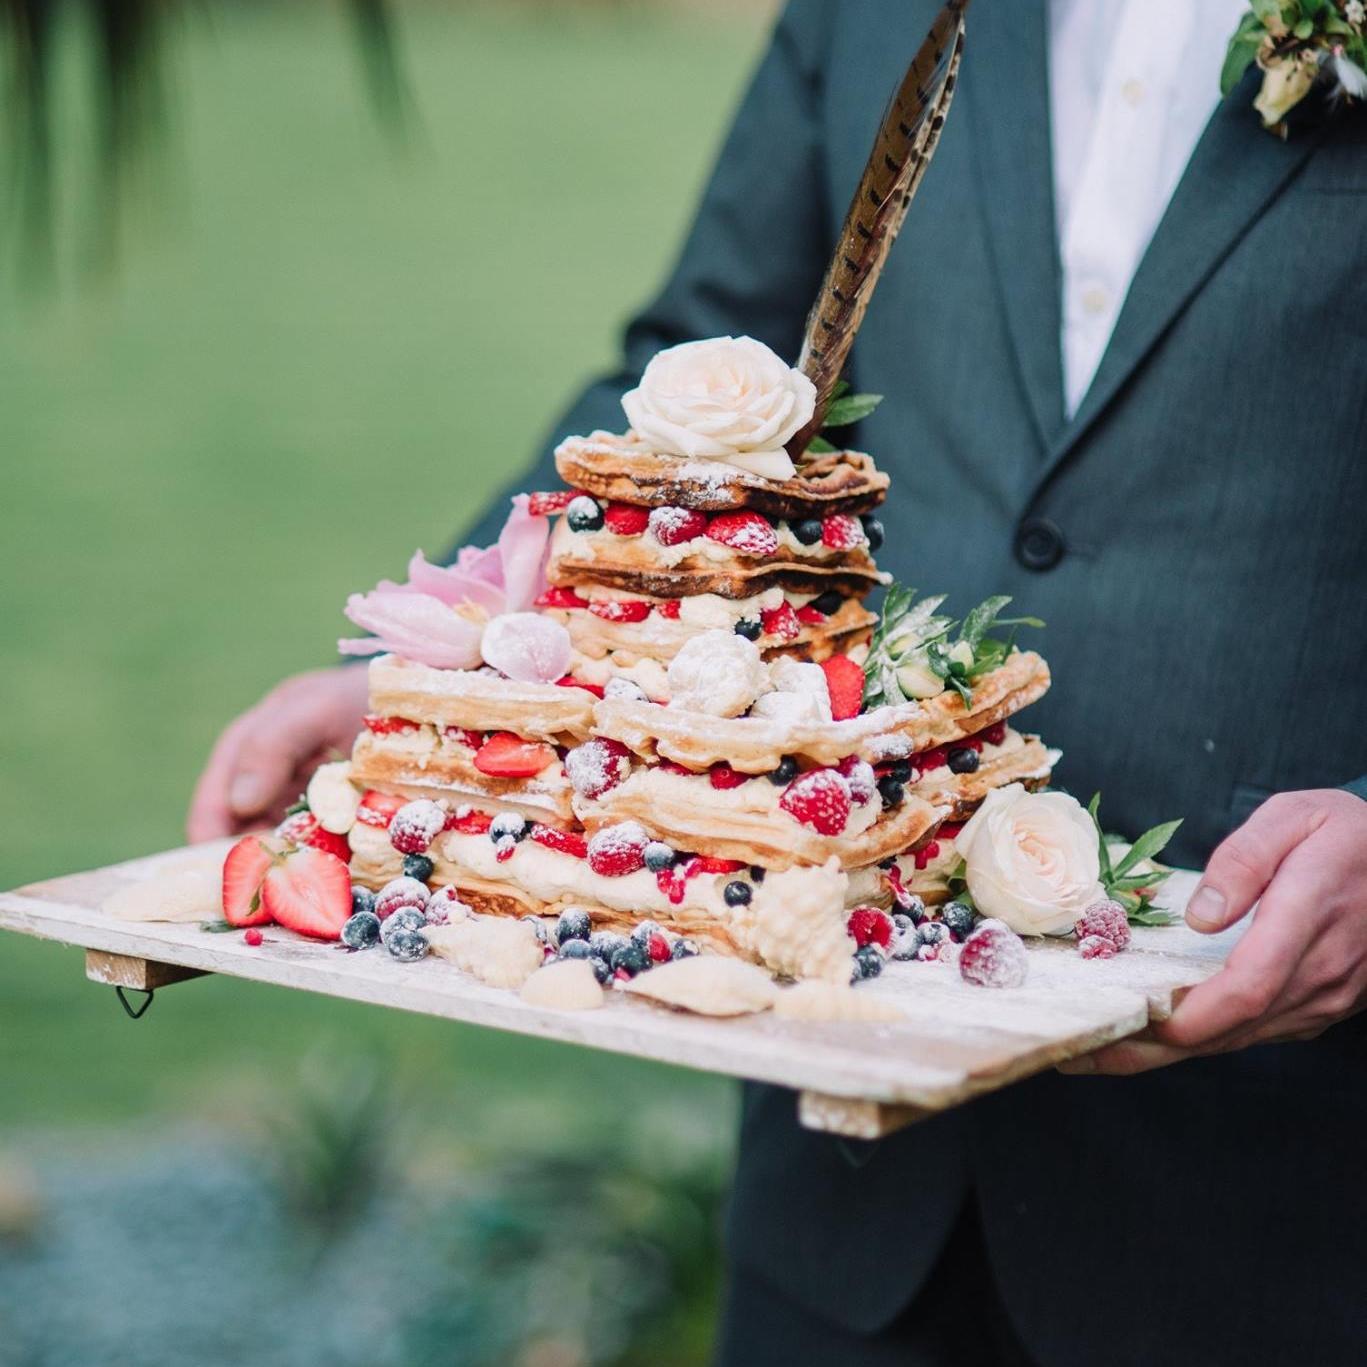 ALTERNATIVE DESSERT INSPIRATION  Doughnuts, waffles or Kransekake? A selection of unique alternatives to cake.